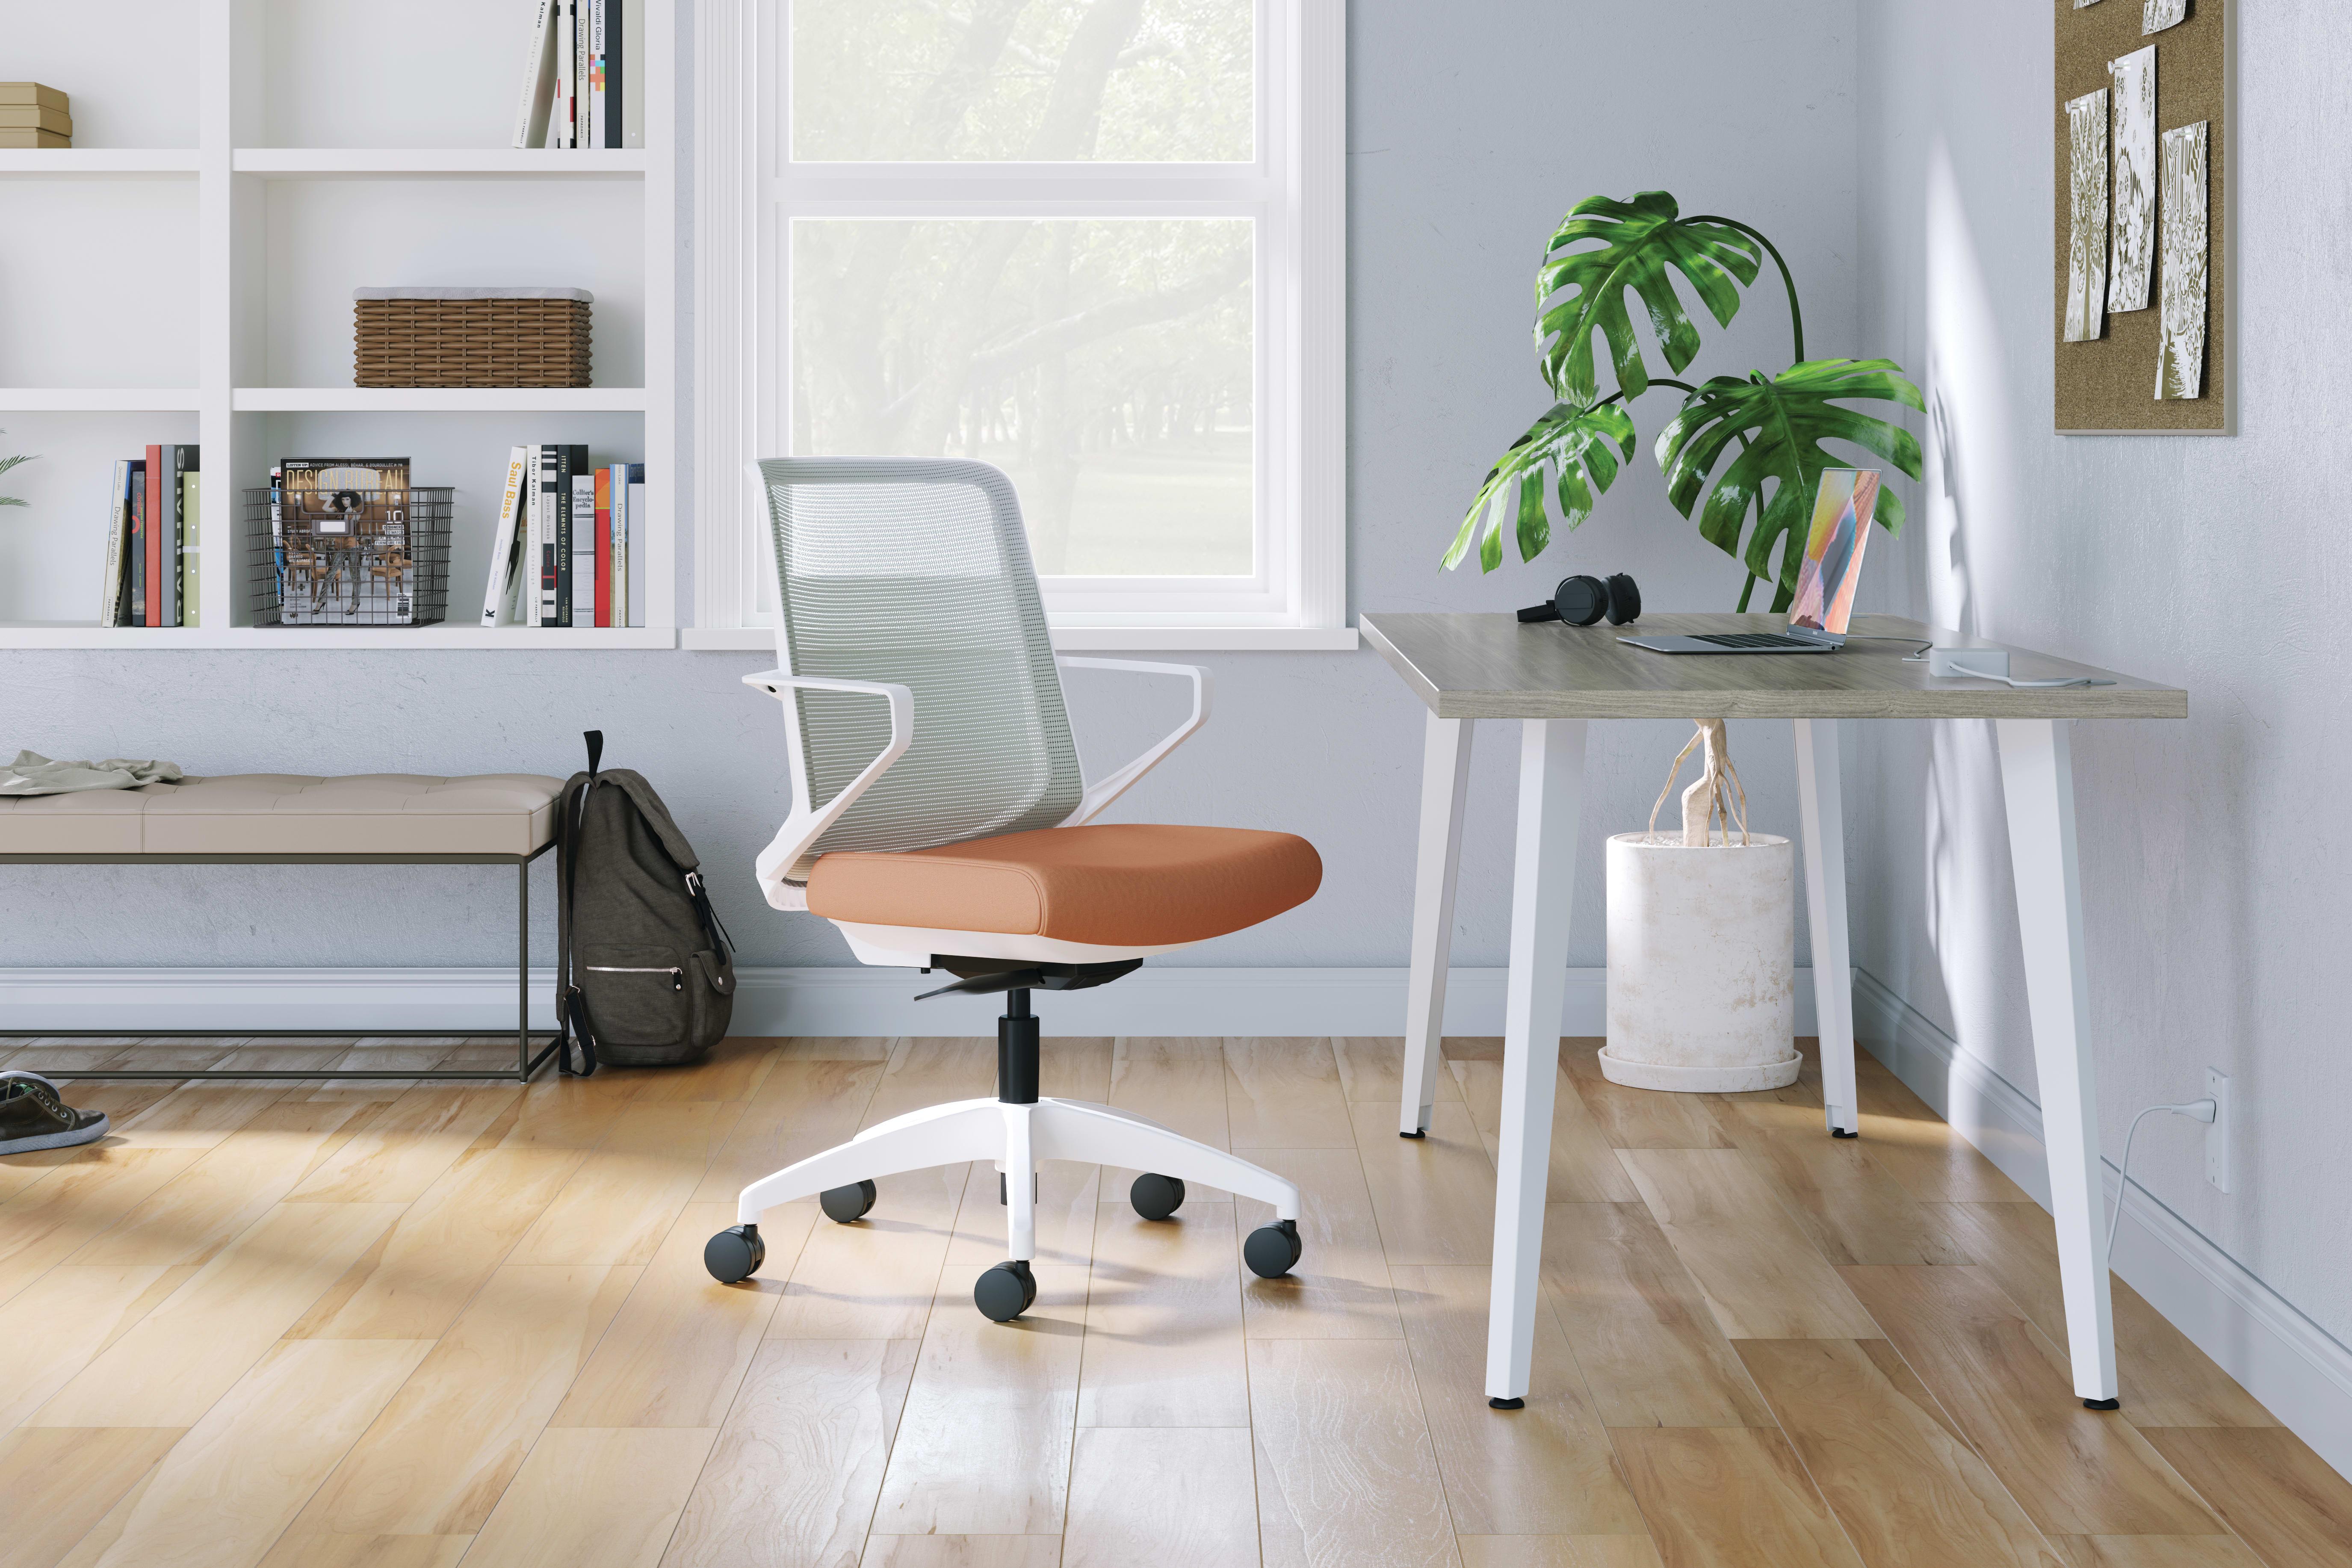 Cliq chair with Voi desk.